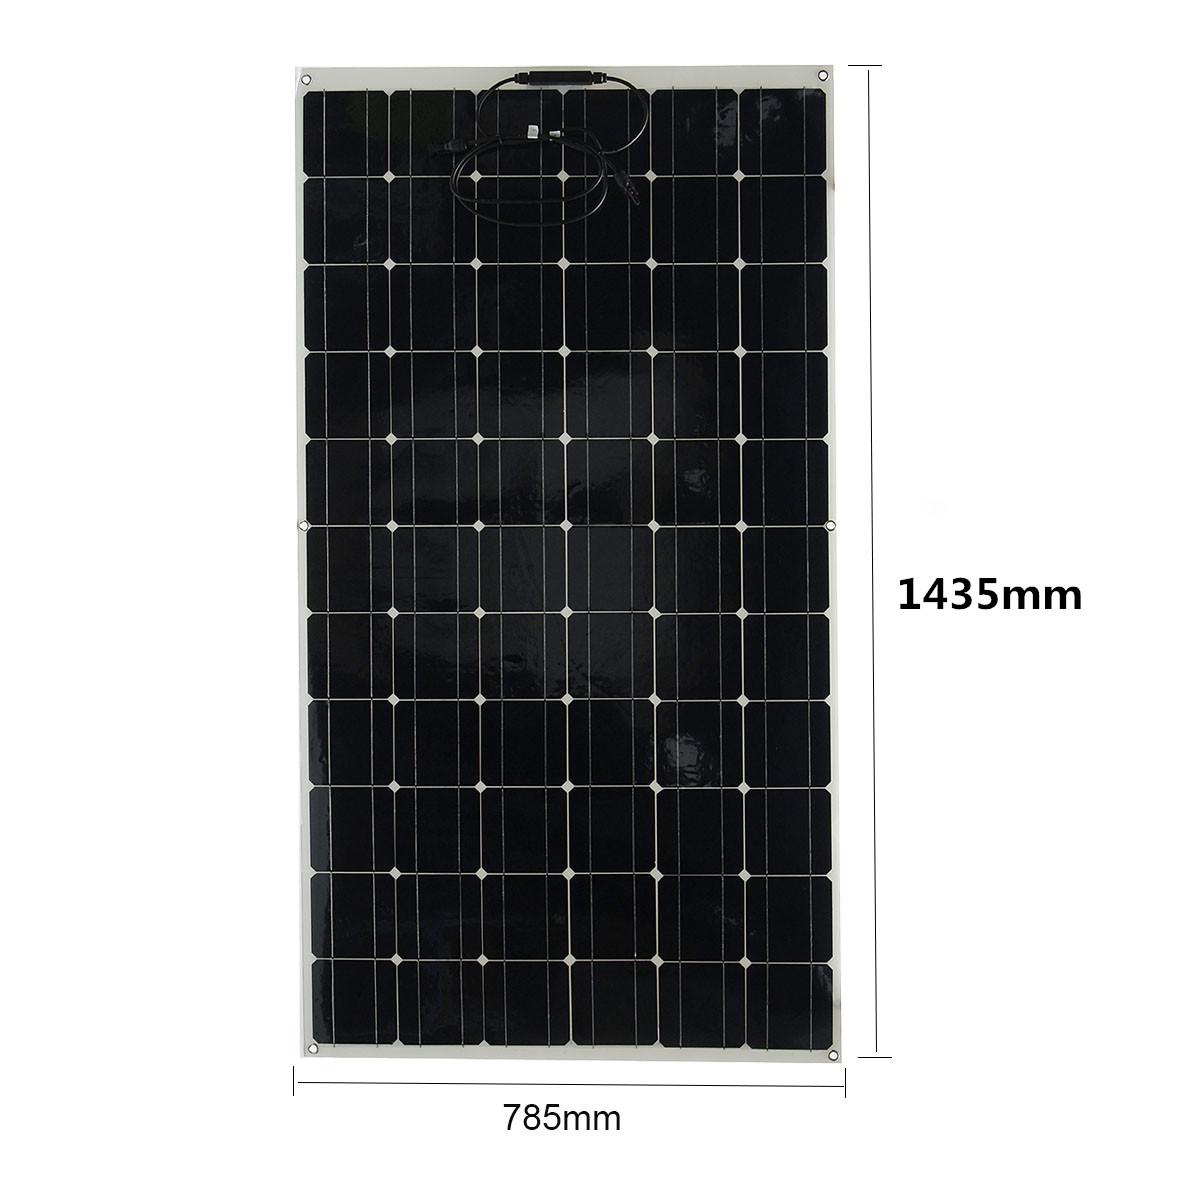 Elfeland EL-42 Mono Solar Panel 190W 33V Flexible Solar City Battery Charger For Home